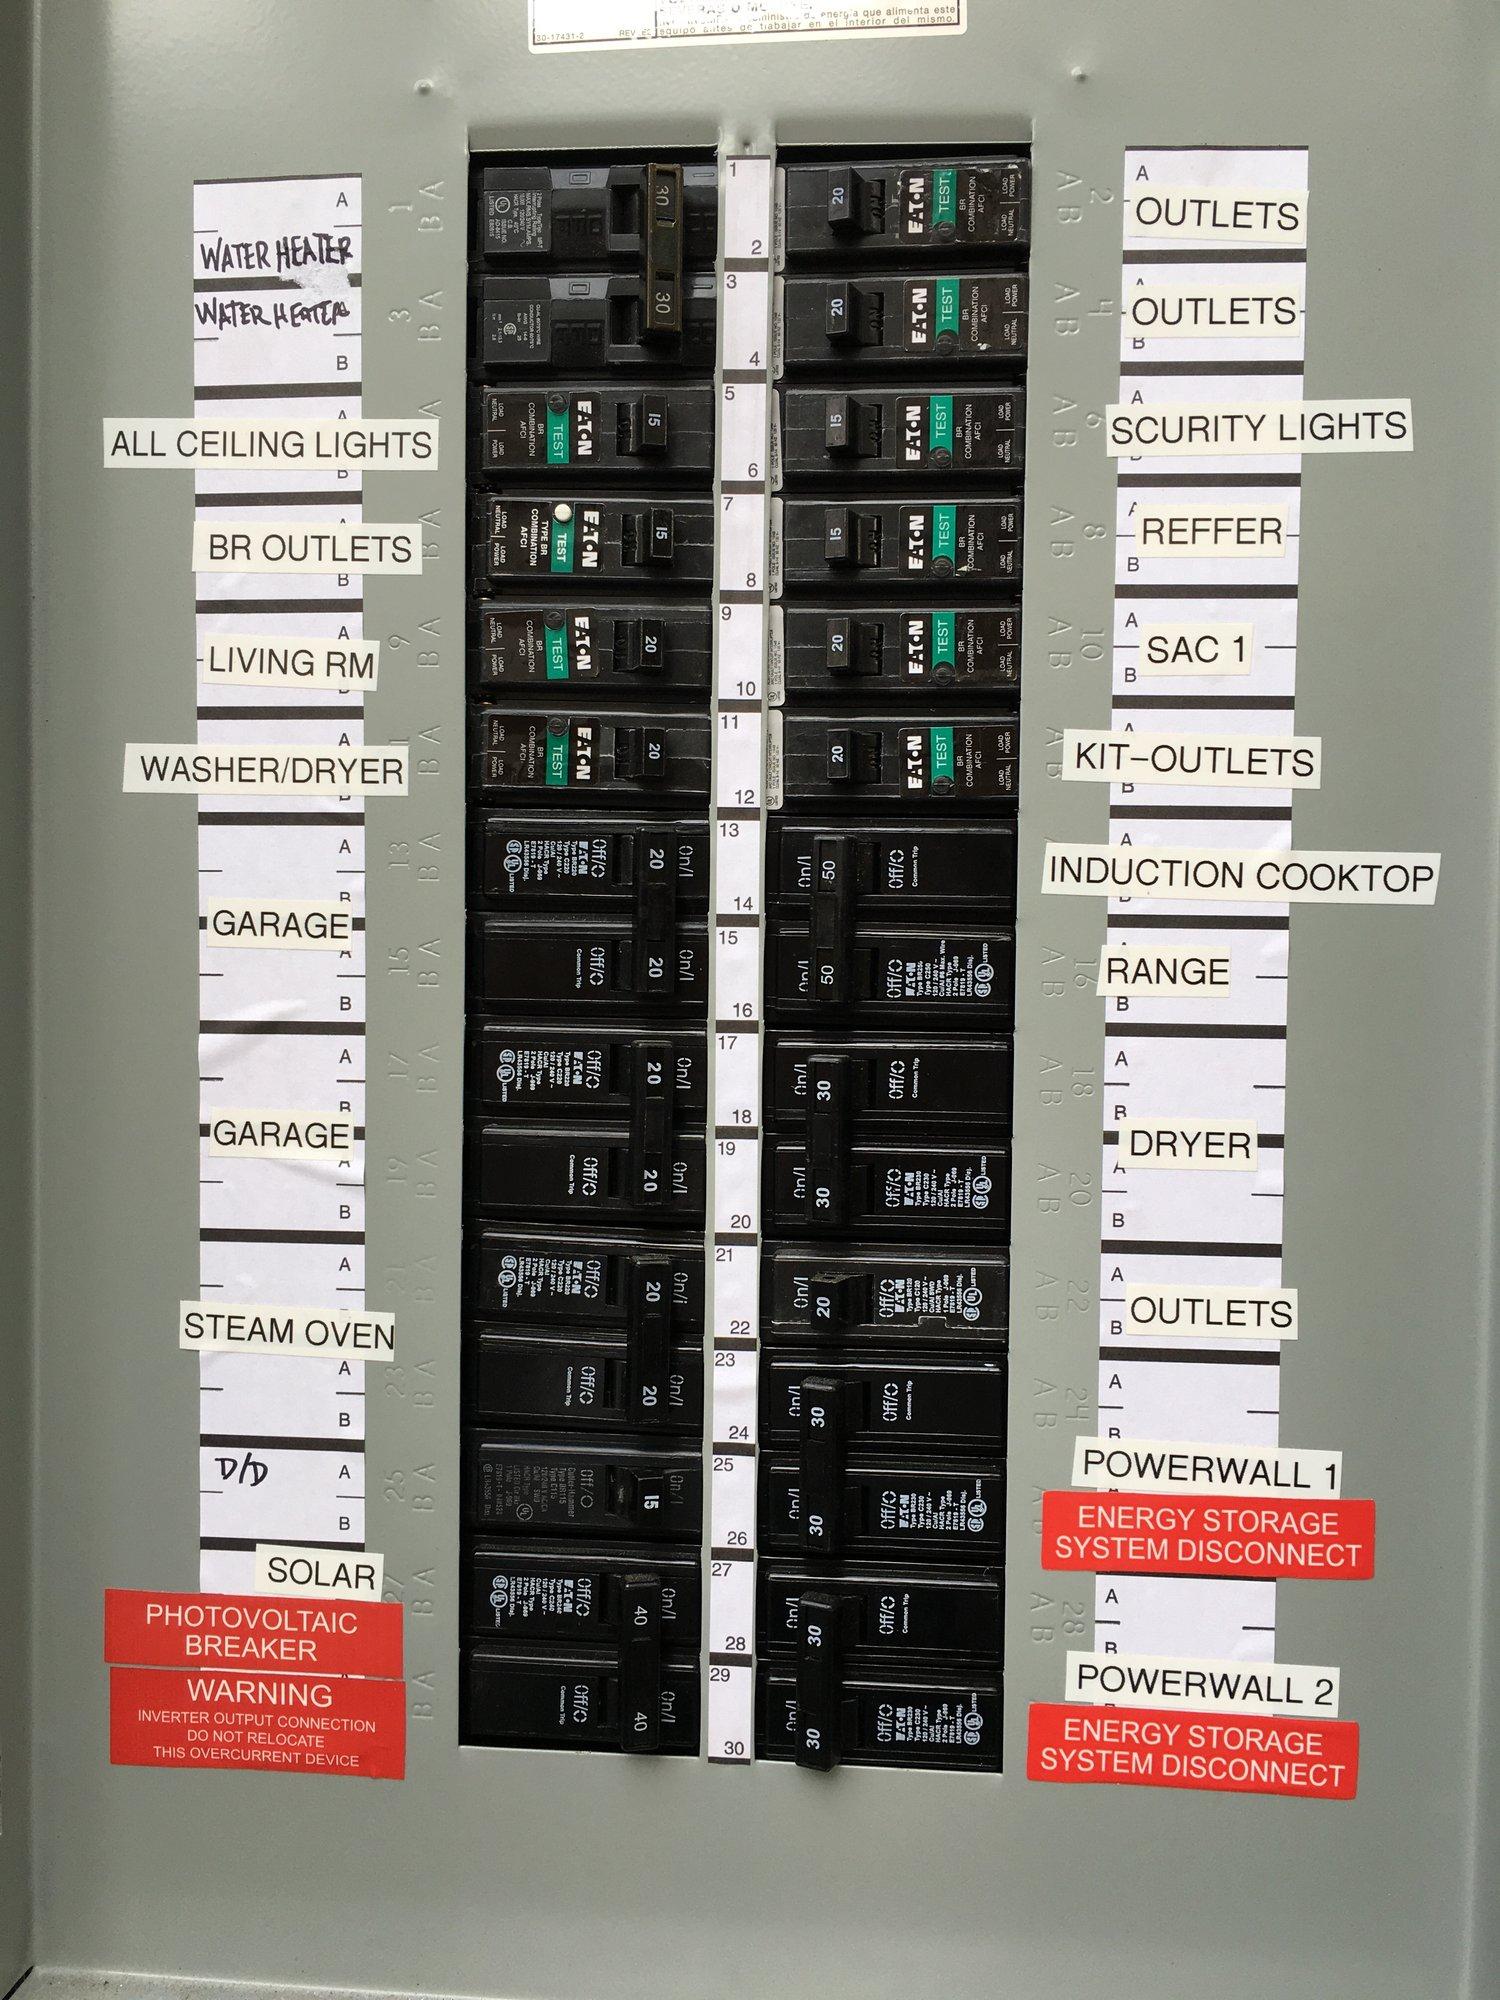 E0B02A2A-092C-4296-8A80-9F743D445E39.jpeg